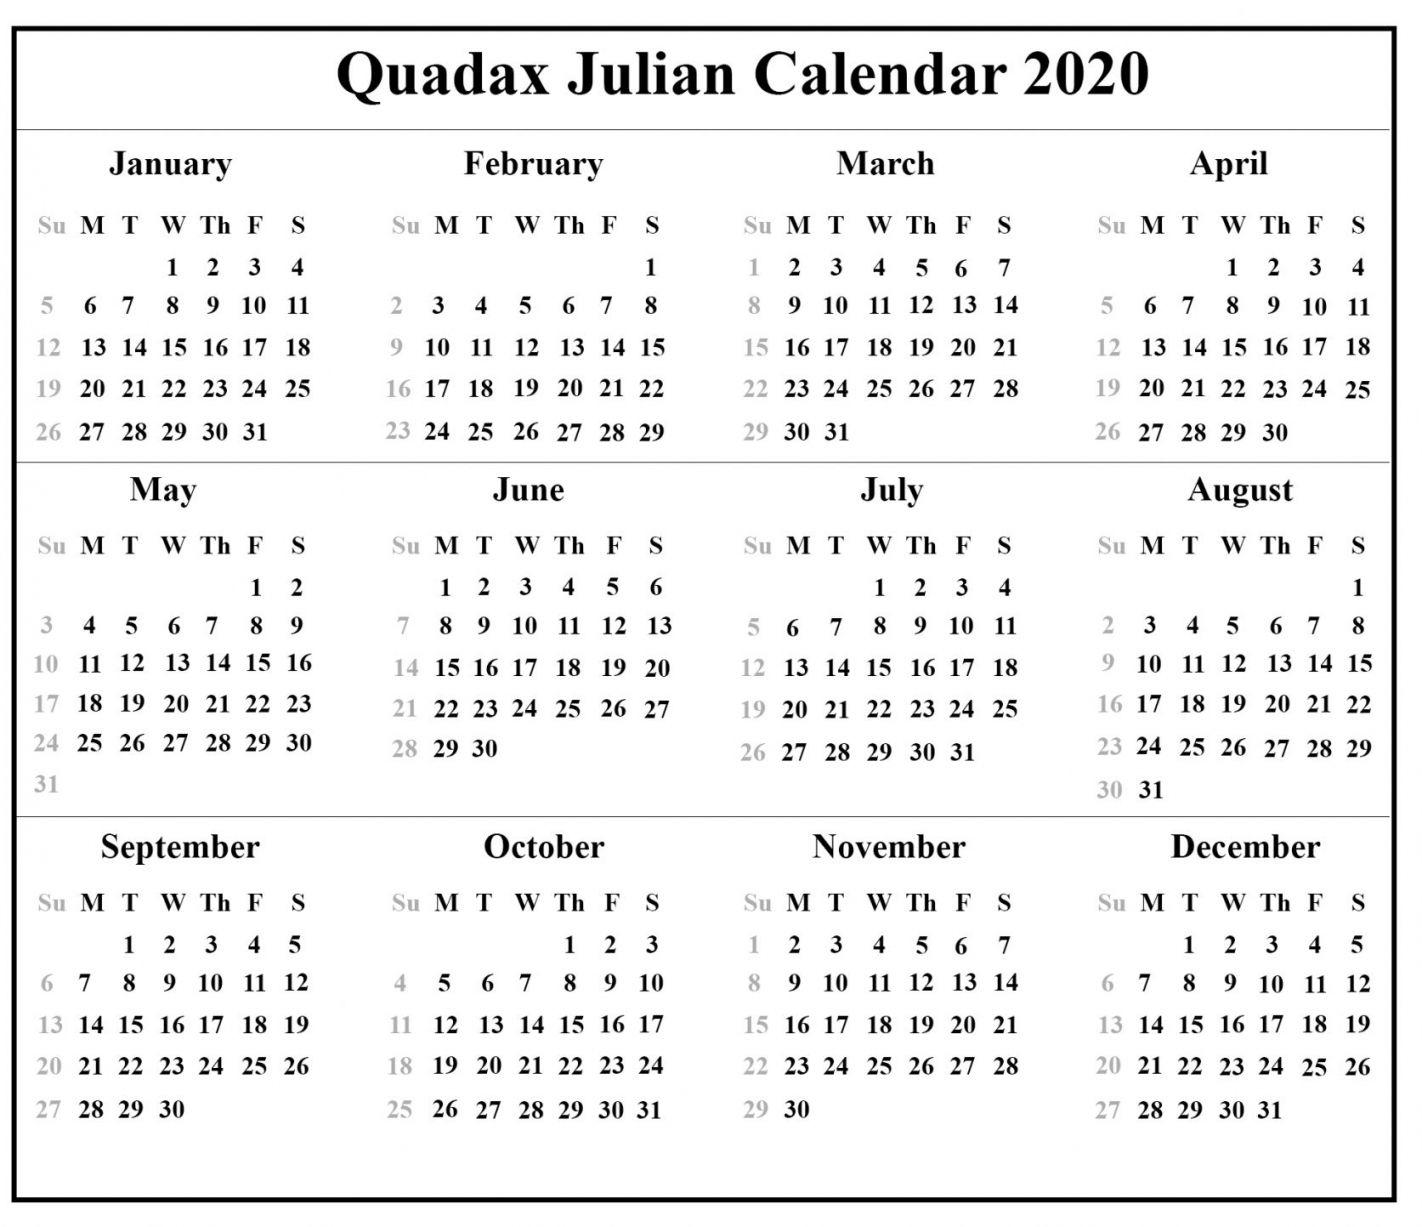 Printable 2021 Julian Calendar In 2020 | Calendar Template with regard to Julian Date Calendar 2021